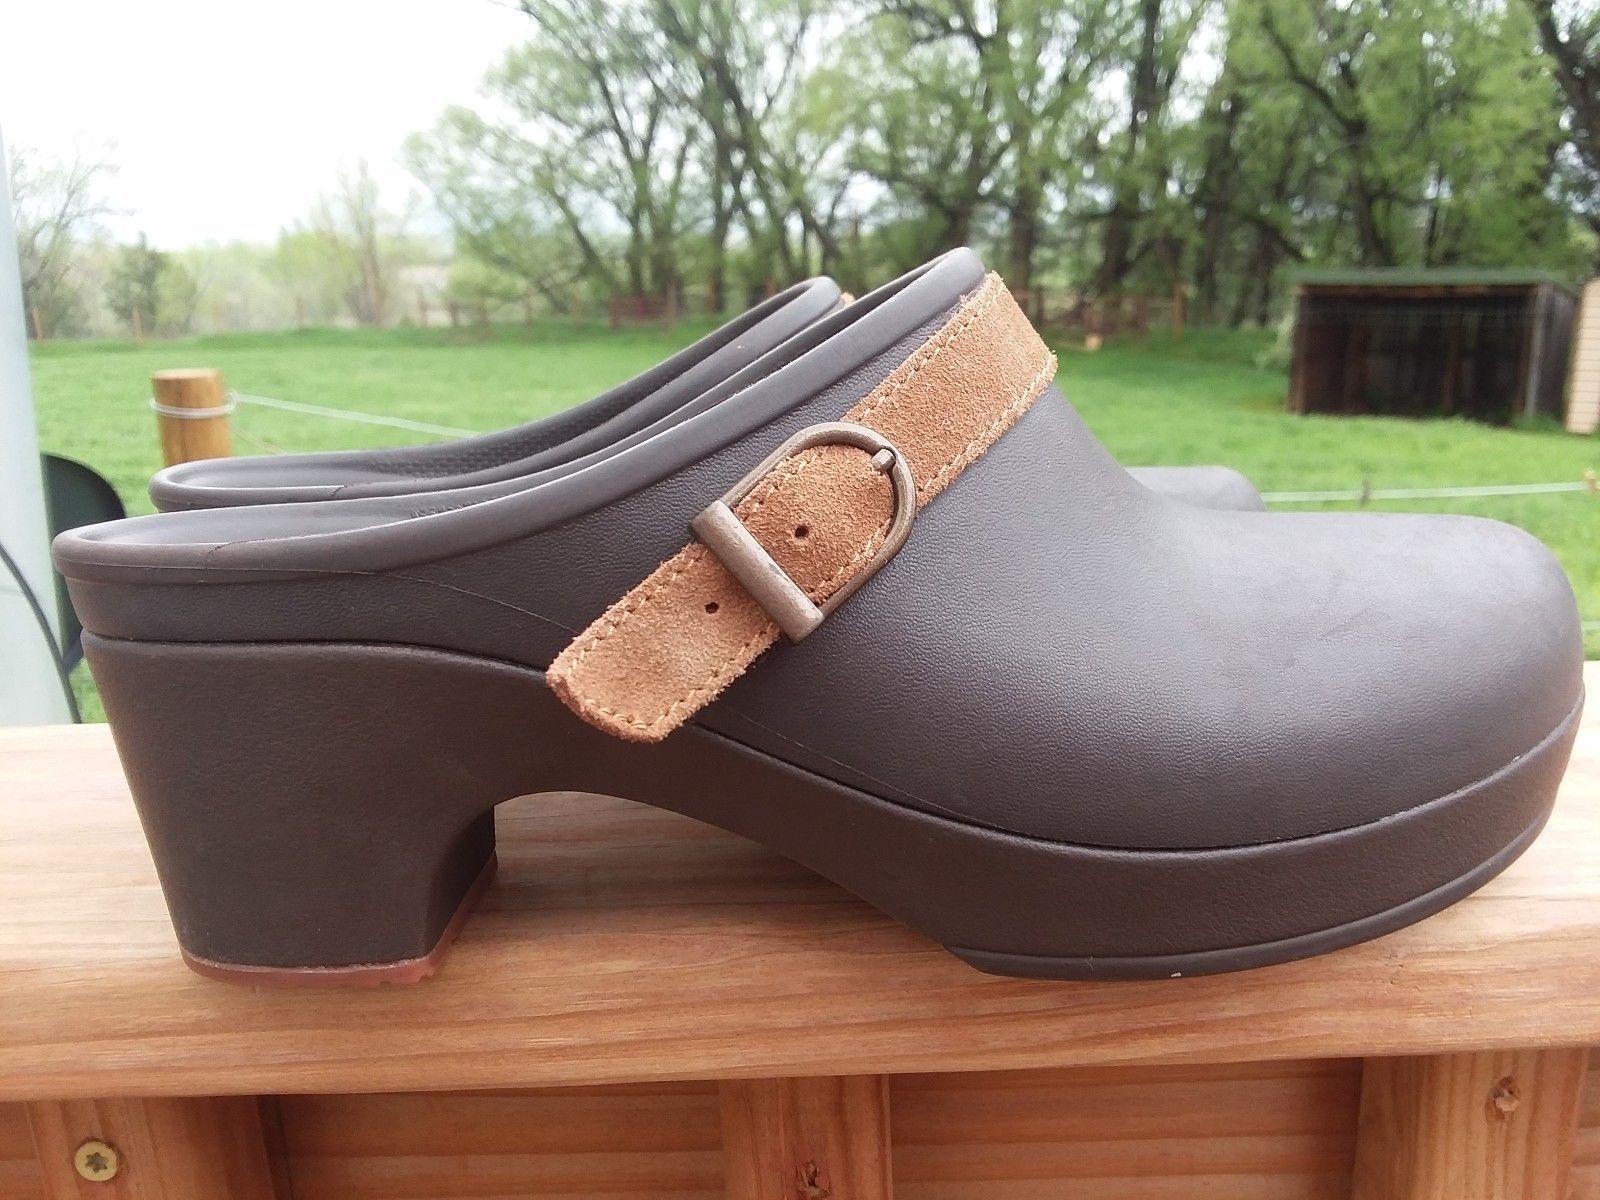 800880ecc4467 Crocs Women's Brown Clogs with 2